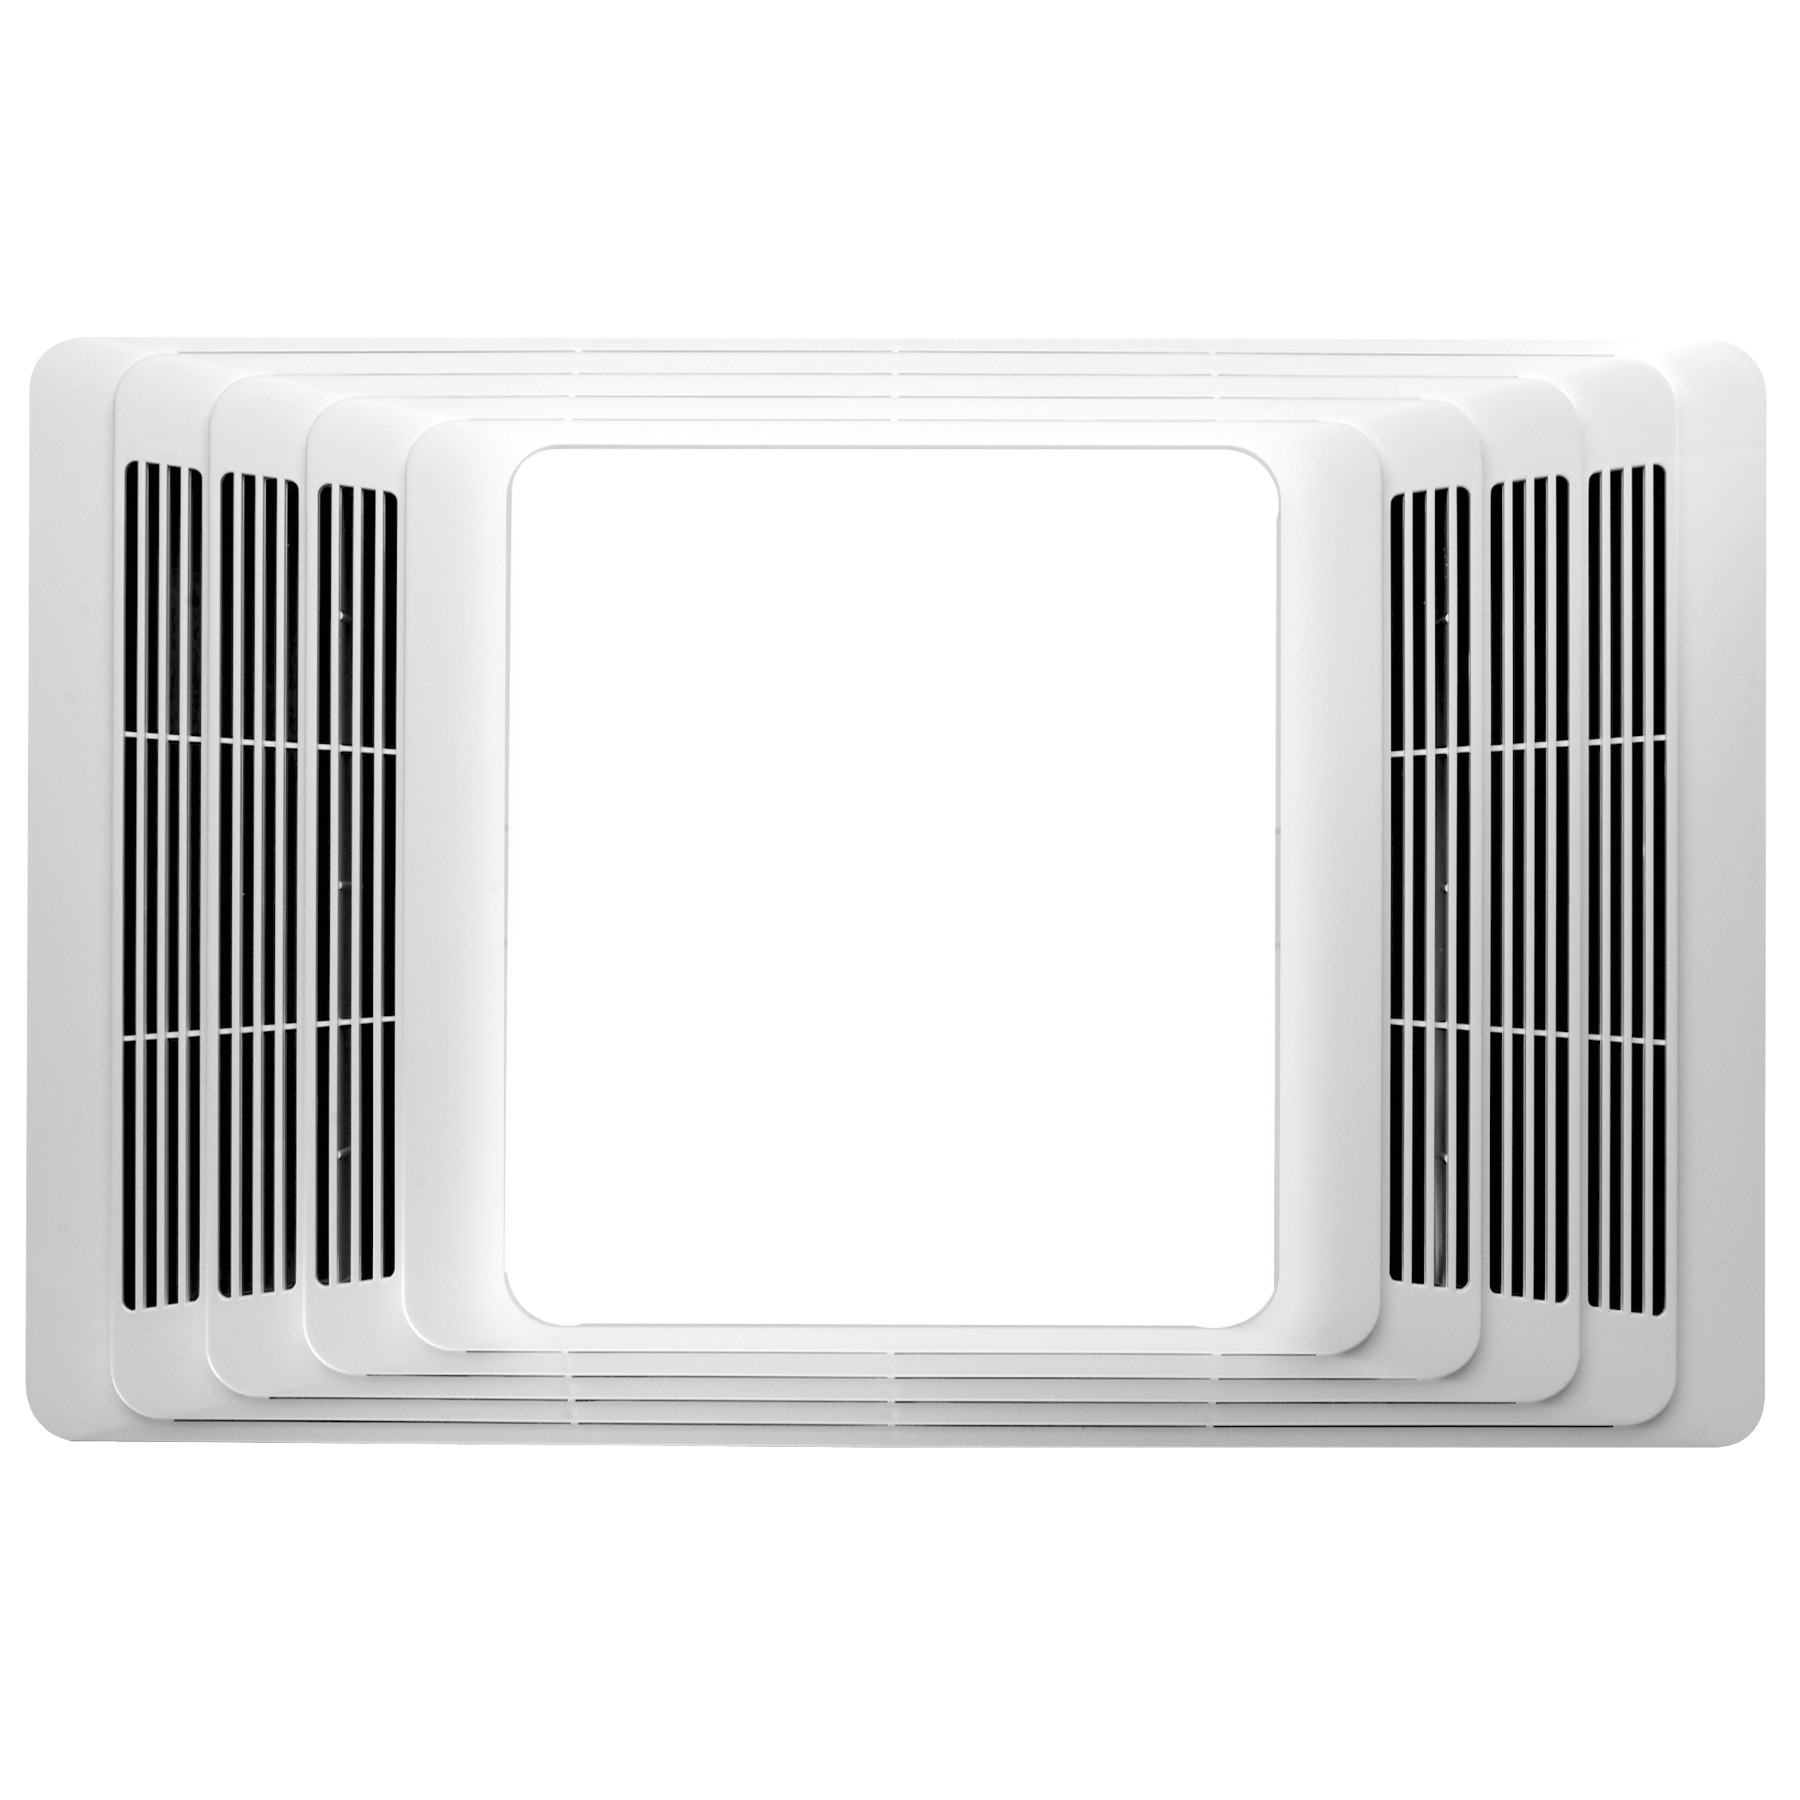 656 Broan Heater Light Combo With, Bathroom Vent Heater Light Combo